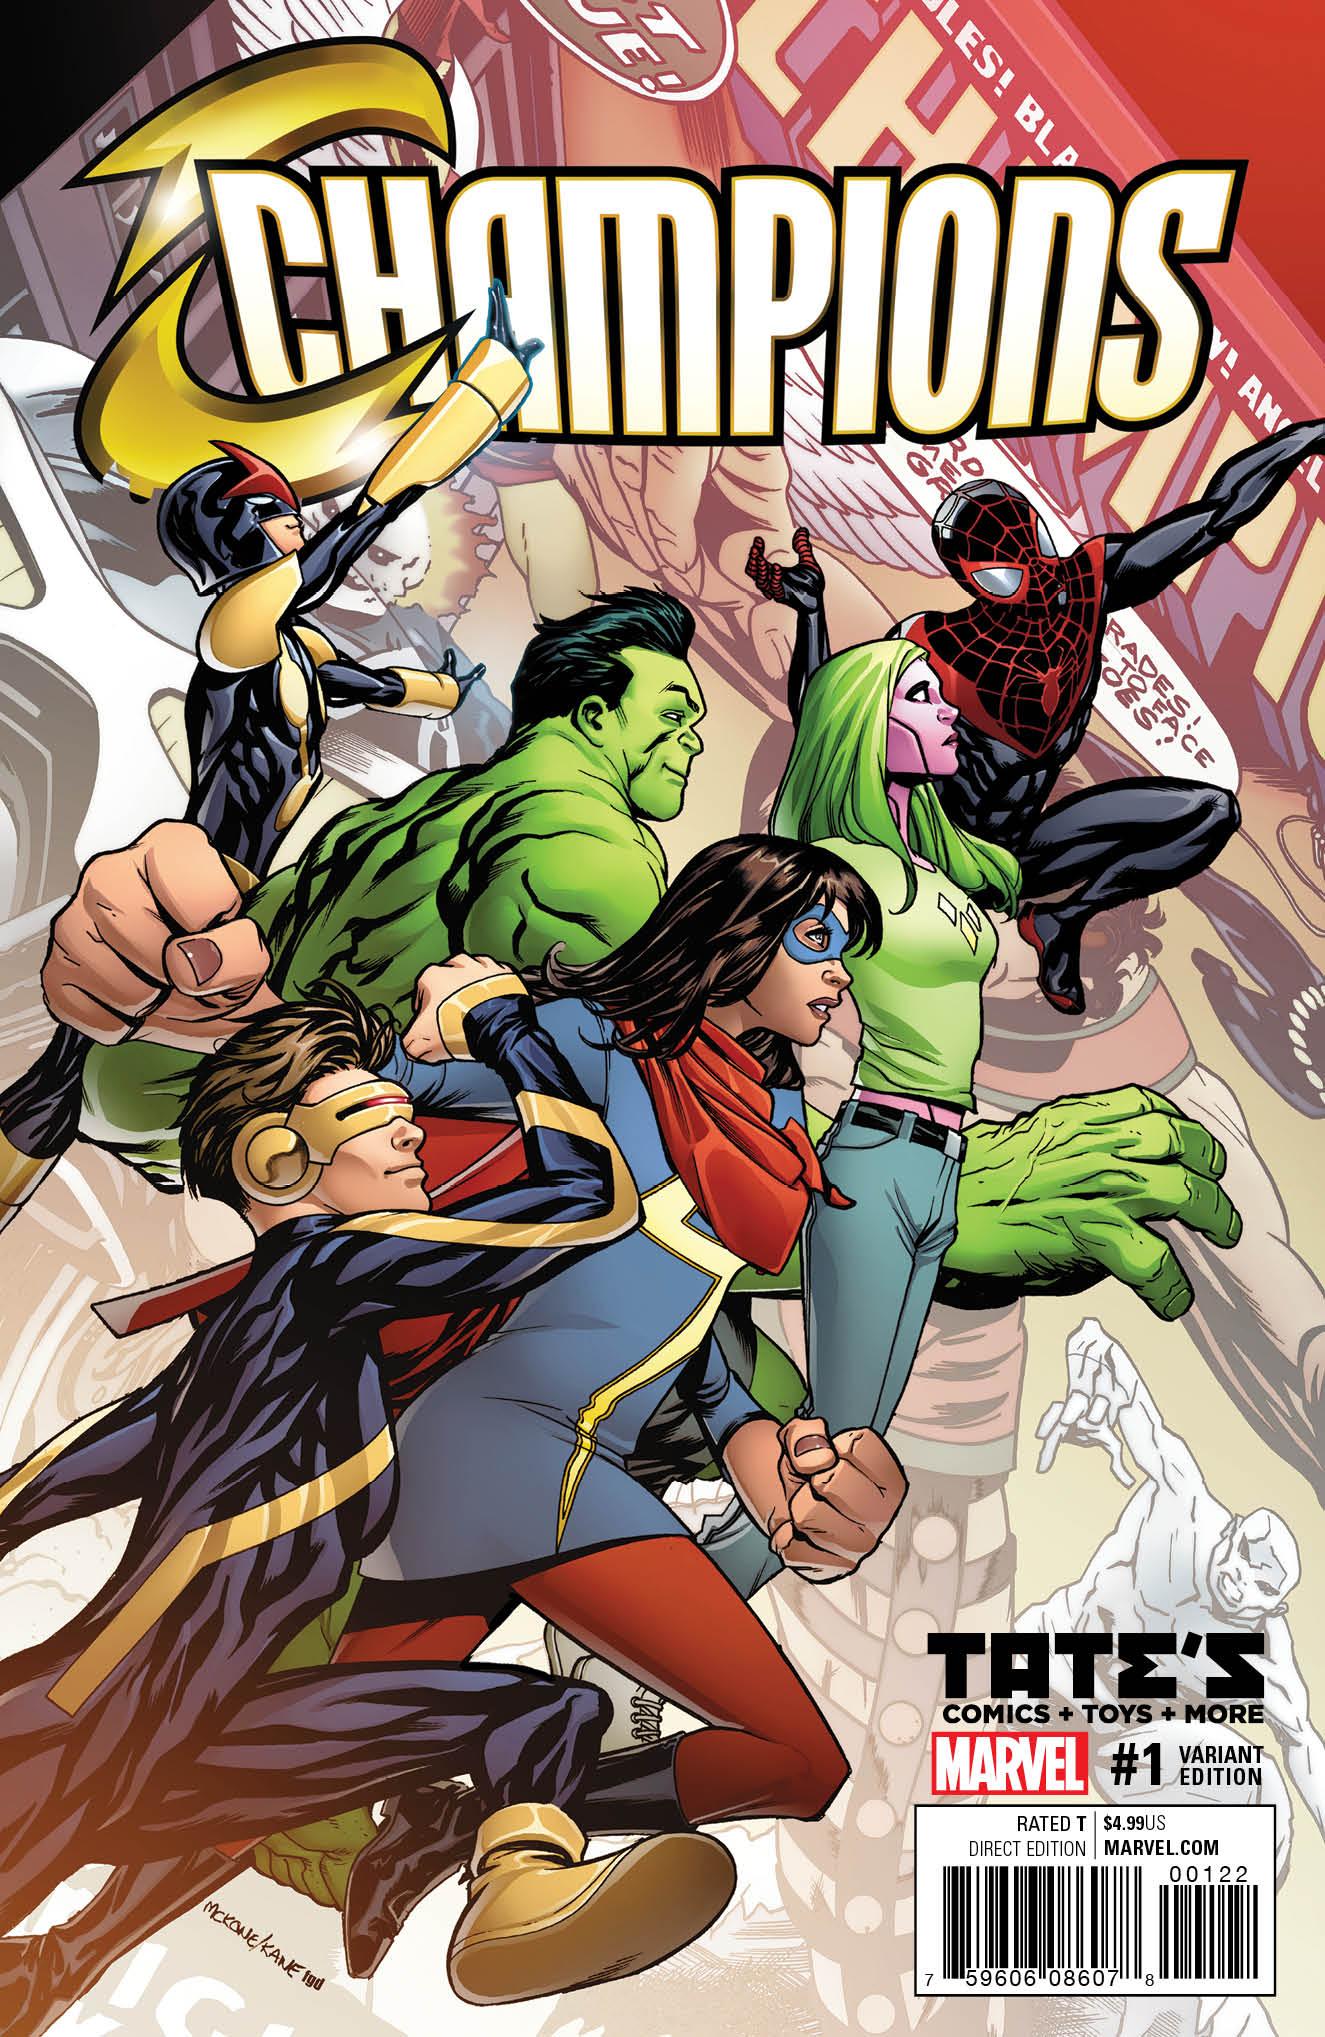 Champions Vol 2 1 Tate's Comics Exclusive Variant.jpg